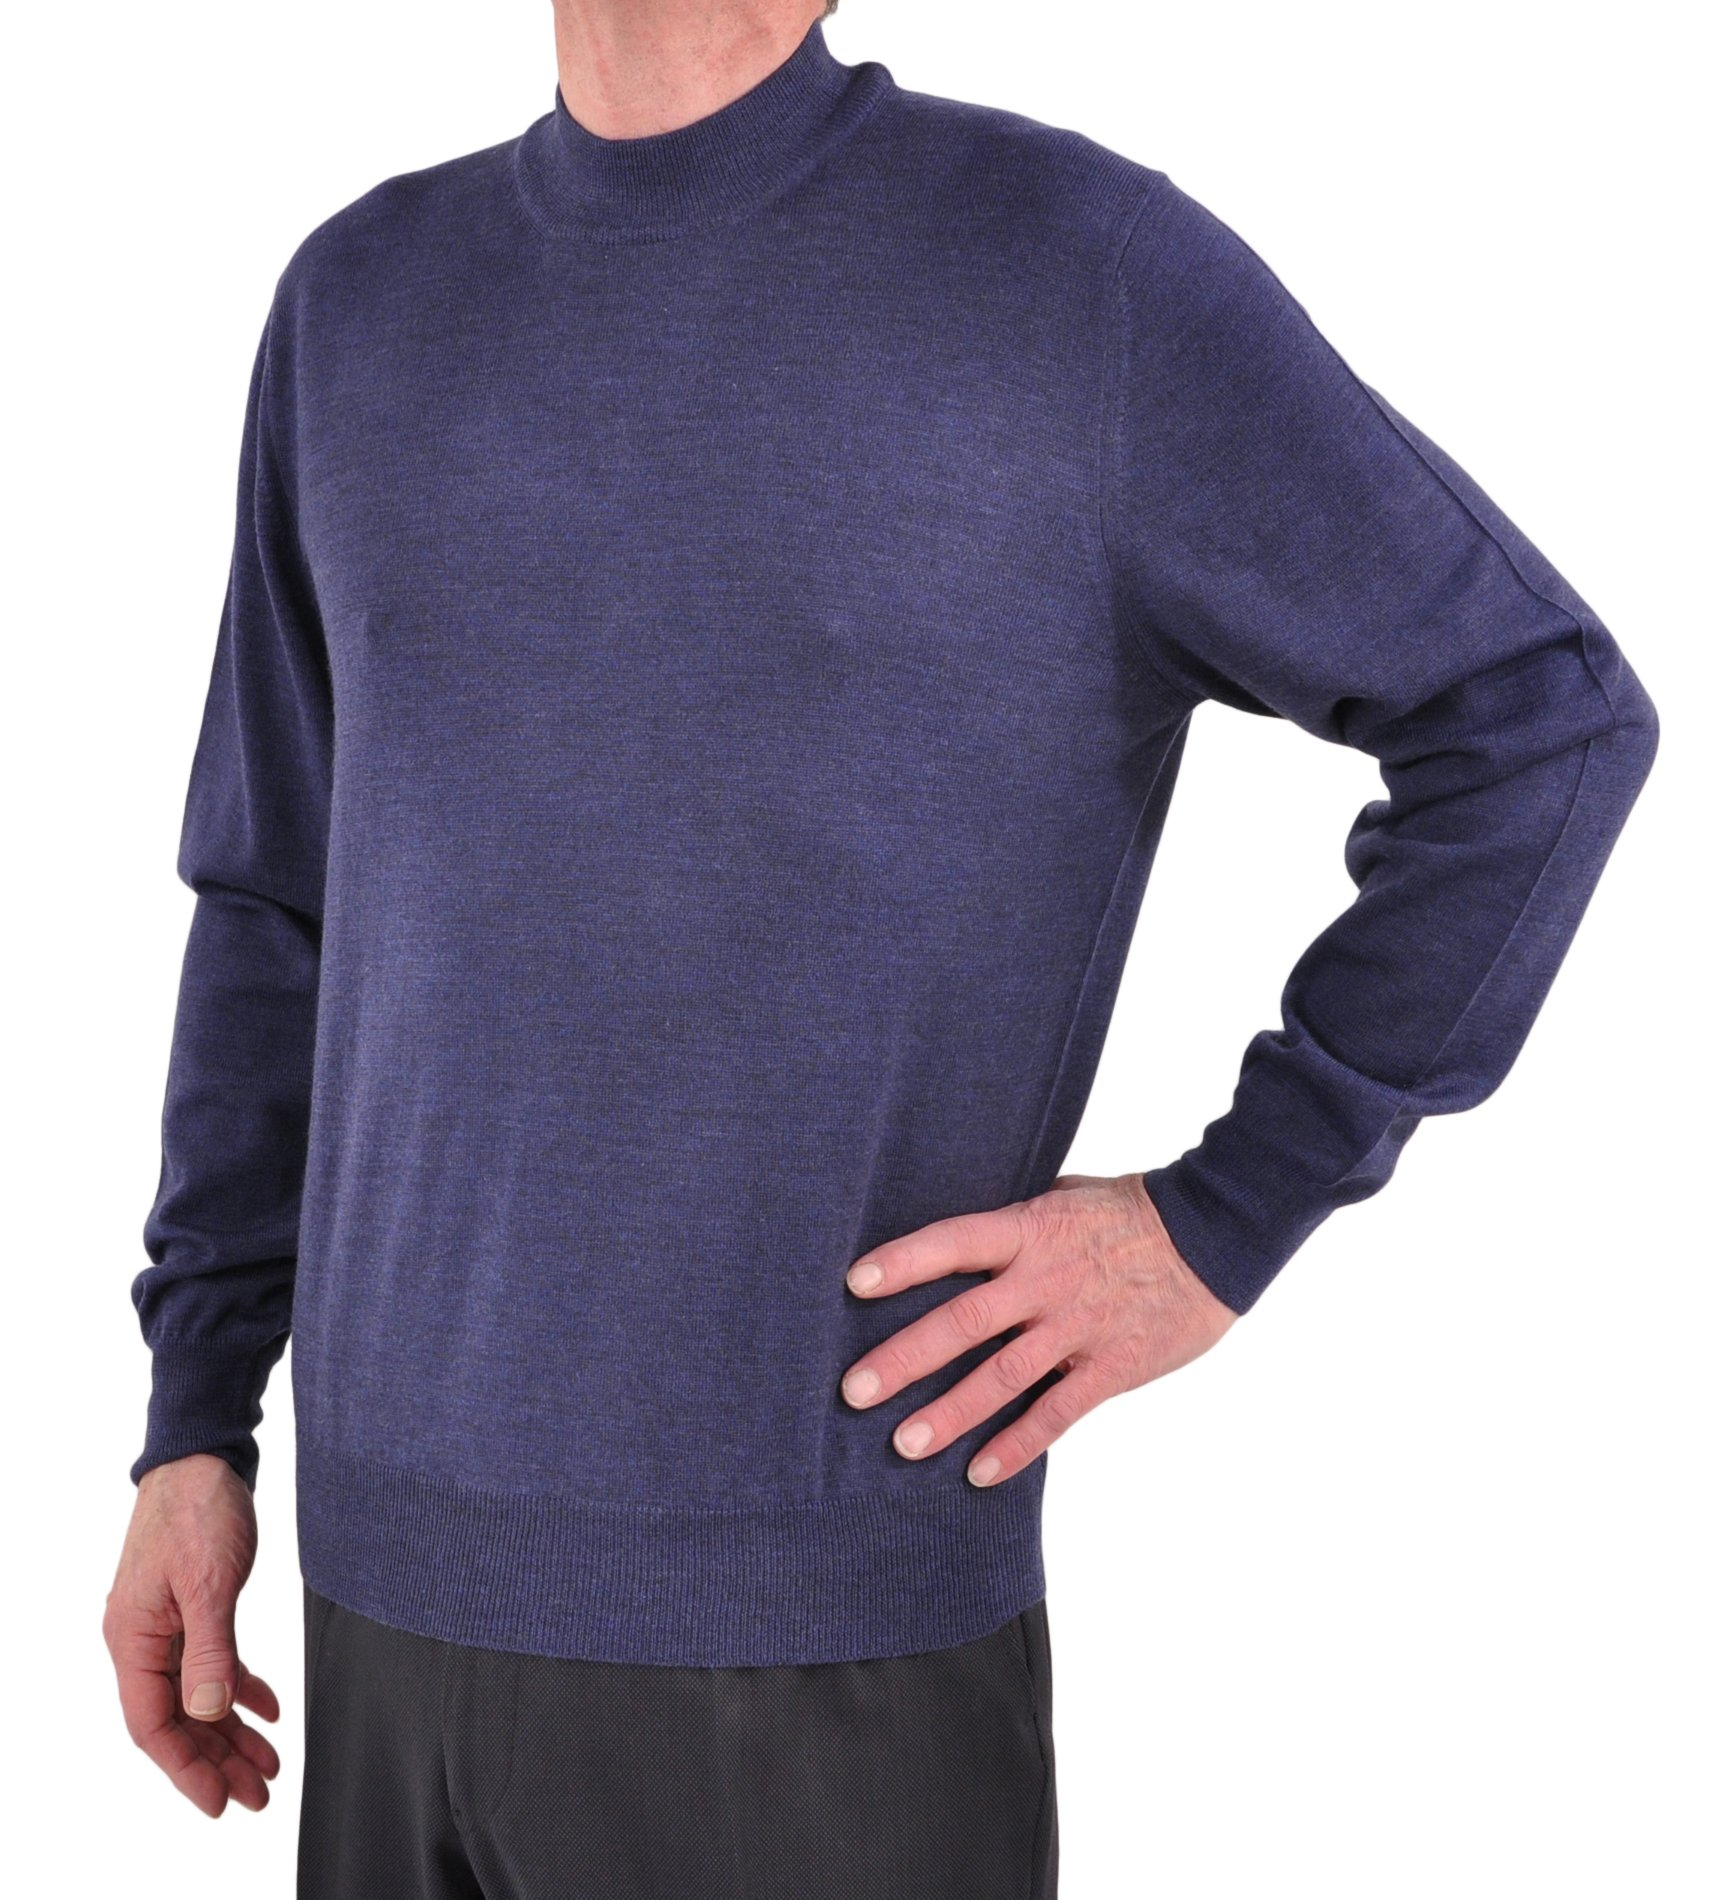 Gran Sasso Extrafine Merino Wool Mock Turtleneck Sweater Medium/Postman Blue by GranSasso (Image #1)